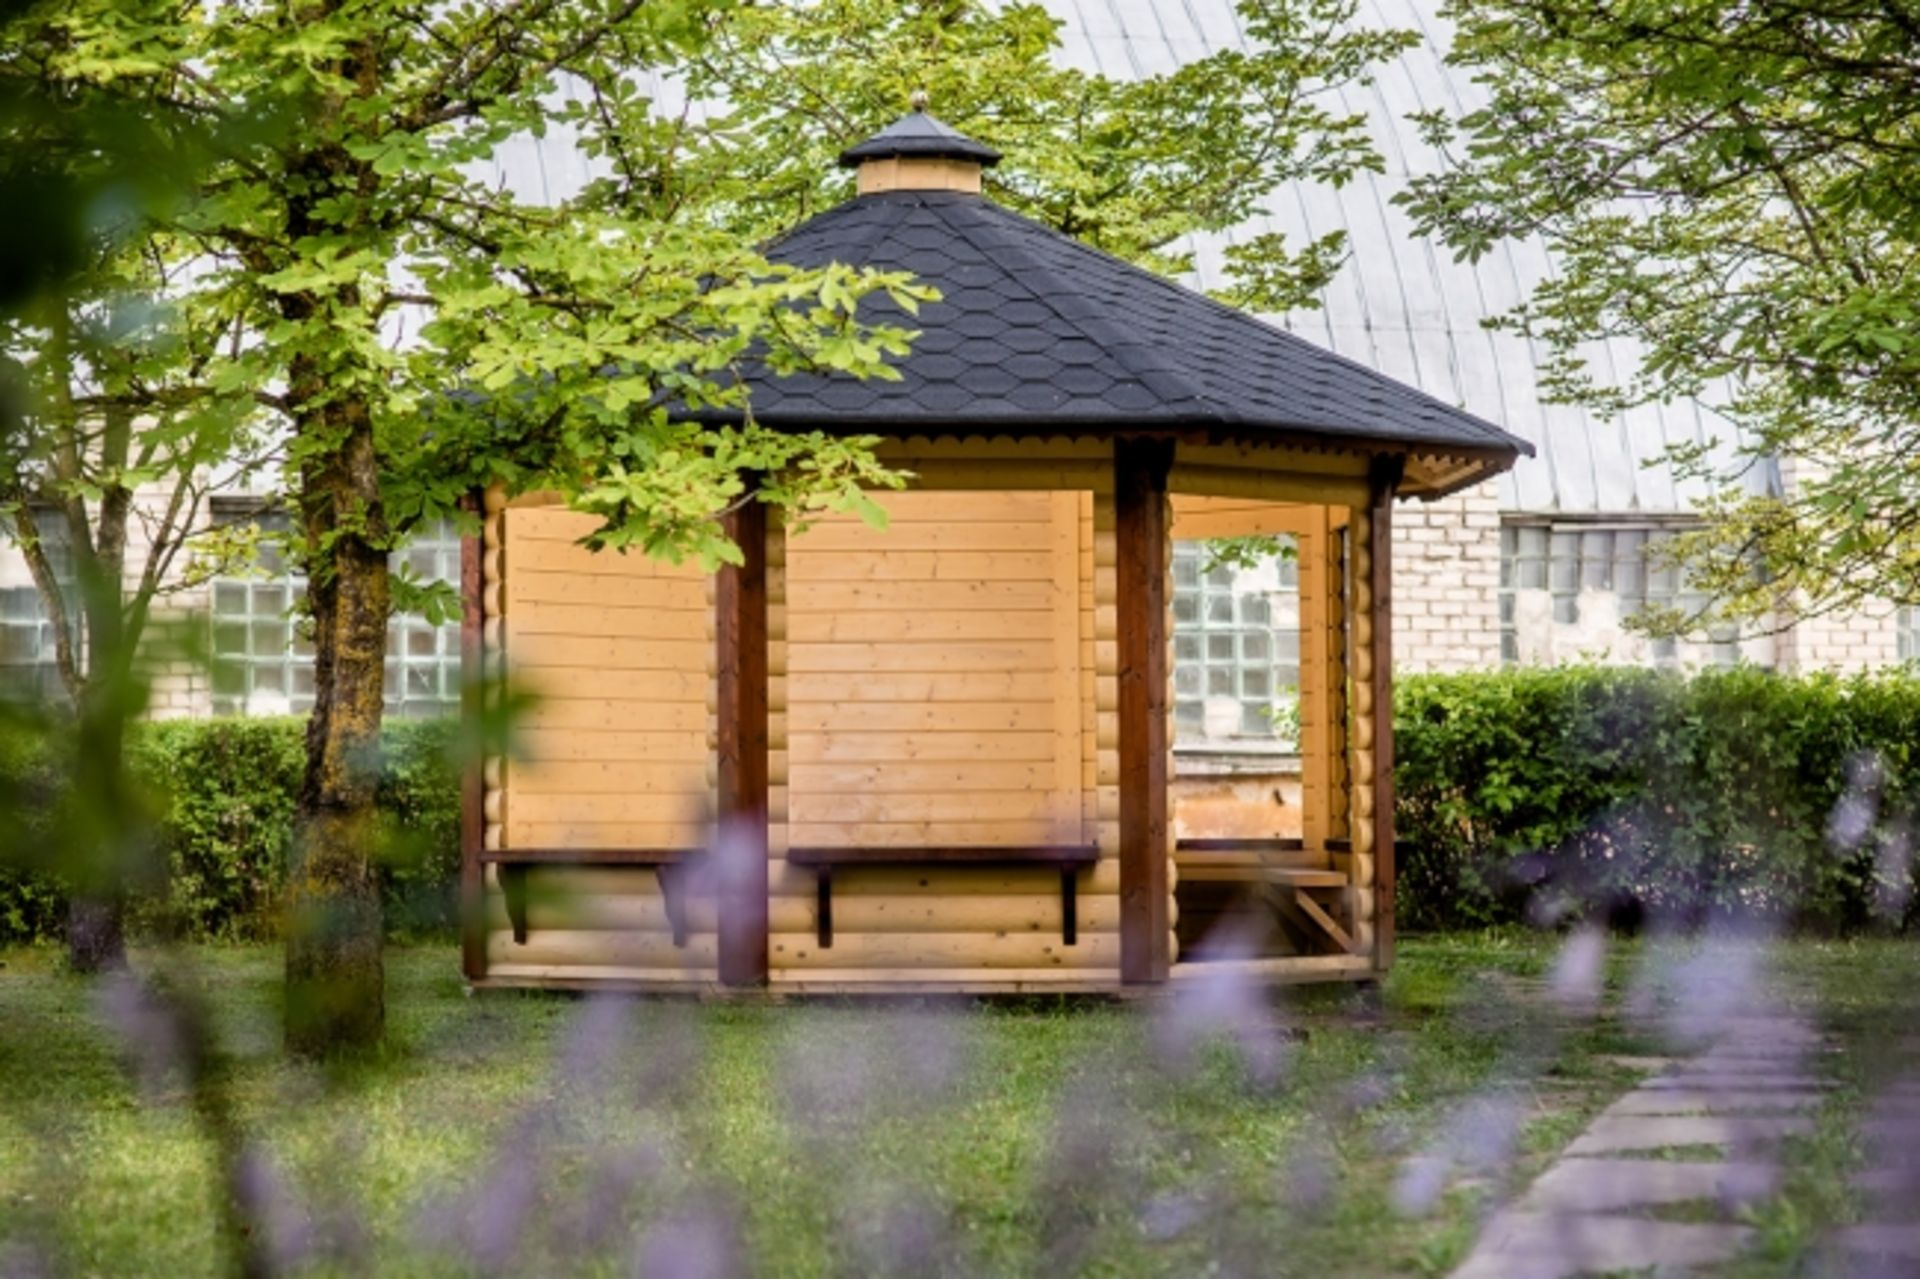 Lot 18059 - V Brand New 9.9m sq Spruce Open Gazebo Pavilion - 8 Corner - 3 Closed Walls - Holds 8-15 People